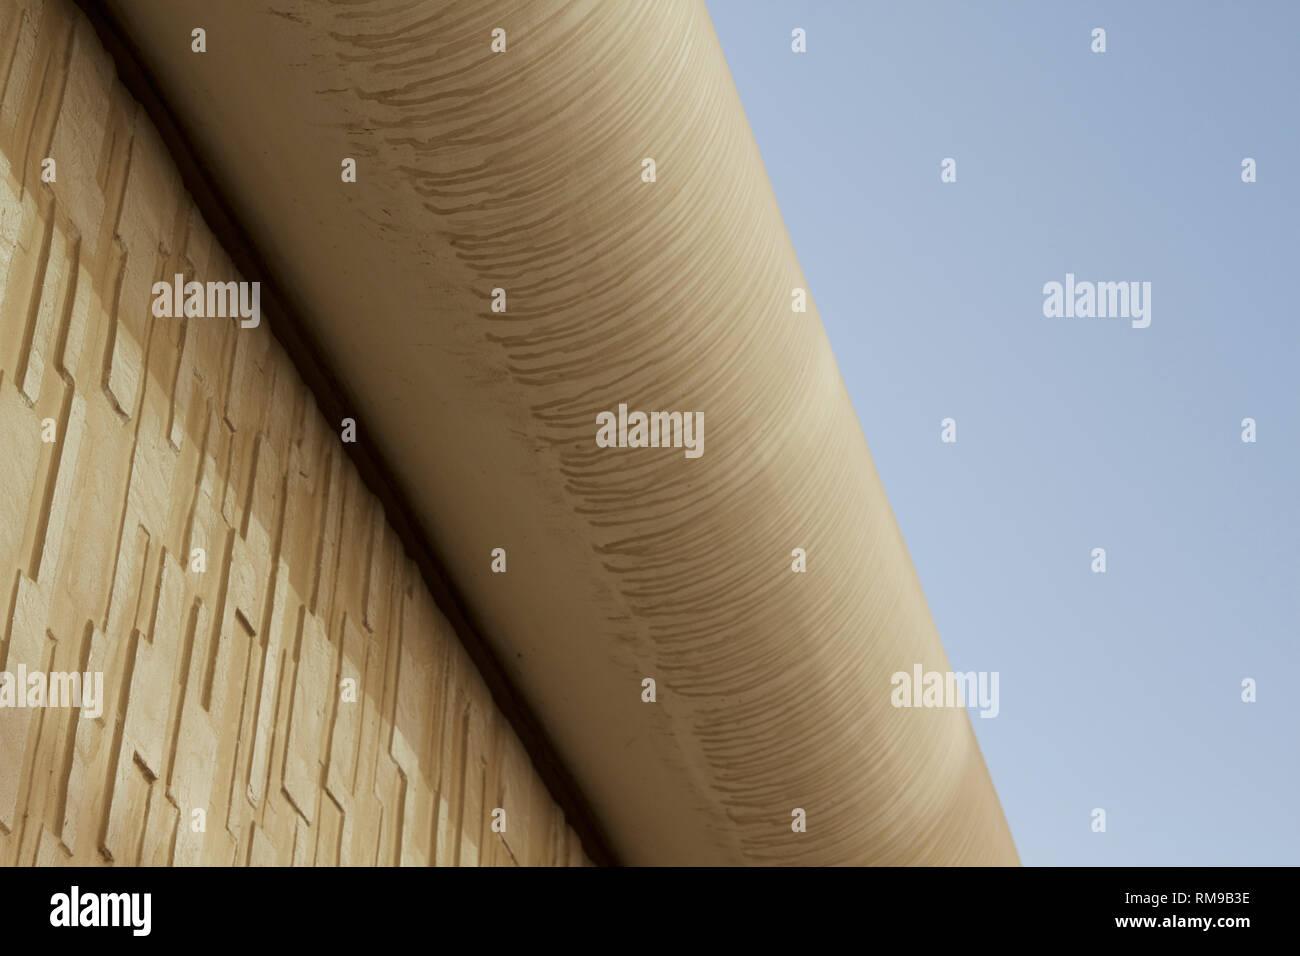 Dubai-Al Emreef street bridge support 4 - Stock Image